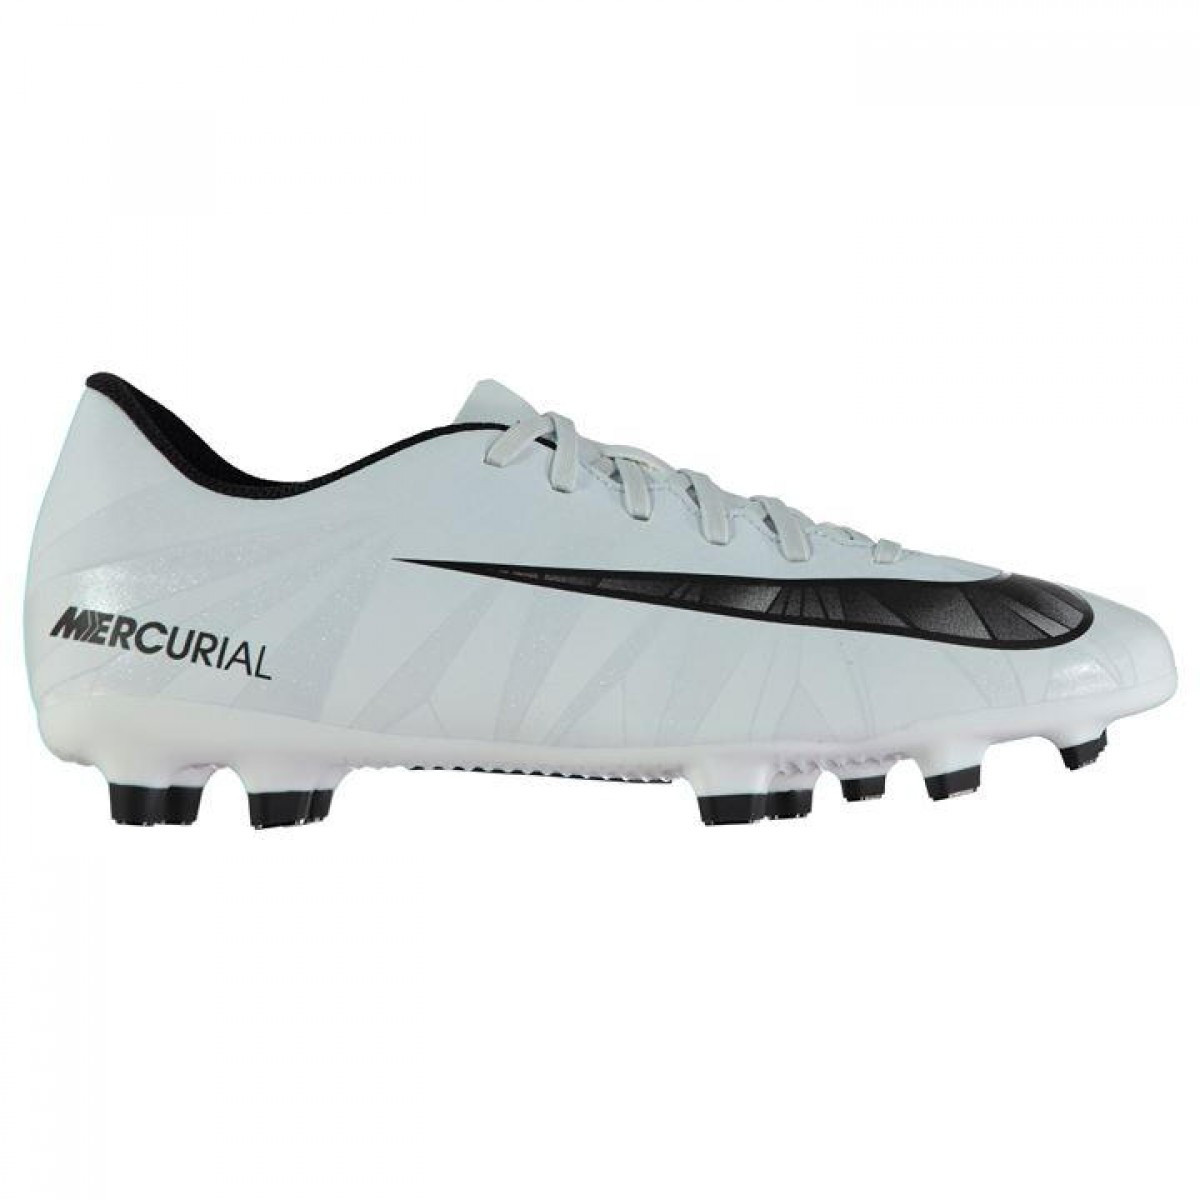 a433e5f6 Бутсы Nike Mercurial Vortex CR7 FG Football Blue/Black - Оригинал - Интернет  магазин